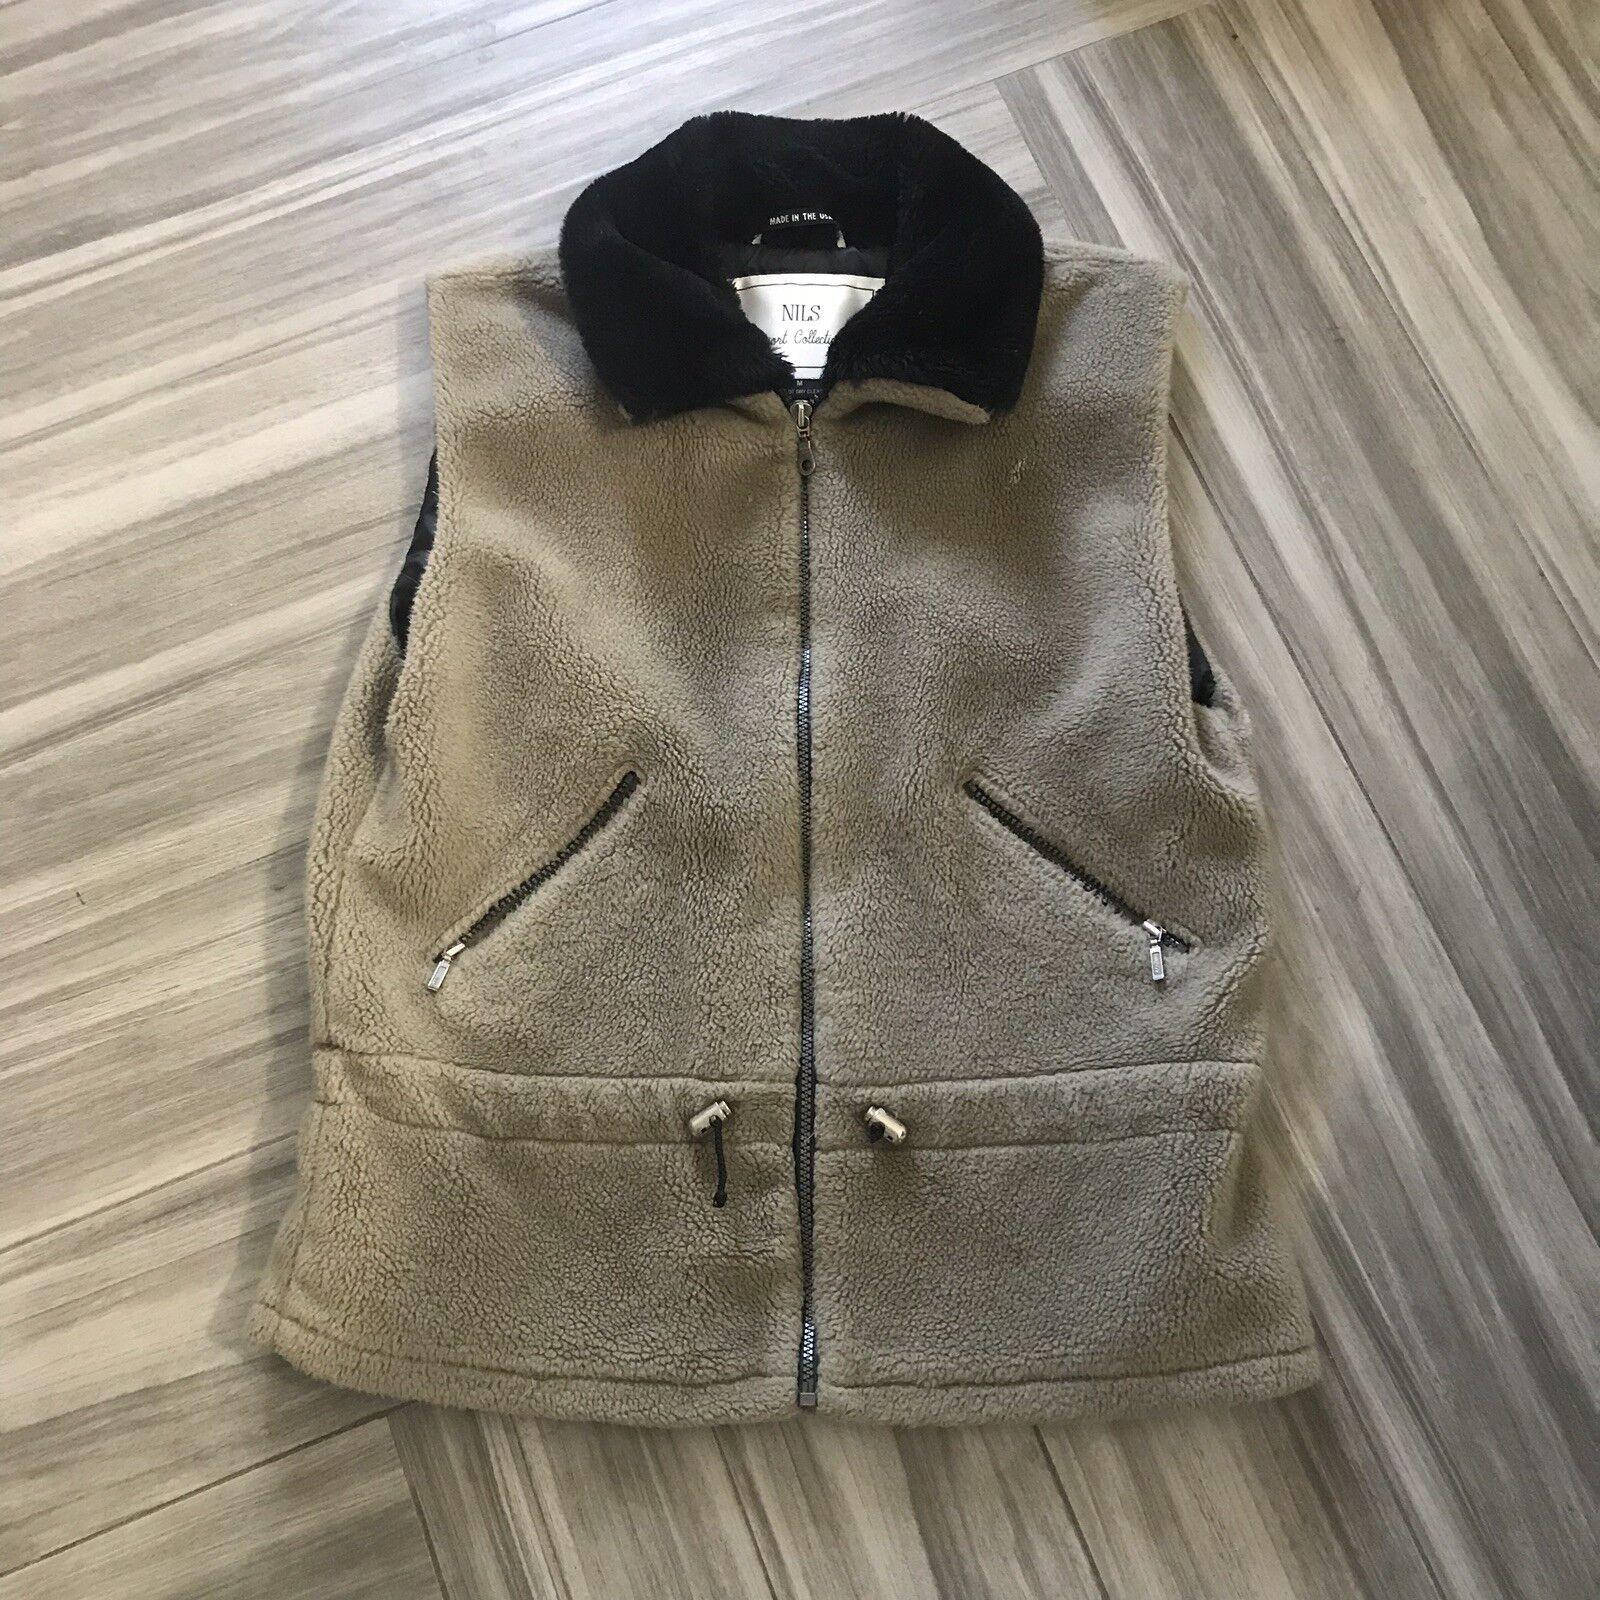 Nils Resort Resort Resort Collection Brown Vest Size Medium Full Zip Fur Collar Warm Sleeveles 584a9e